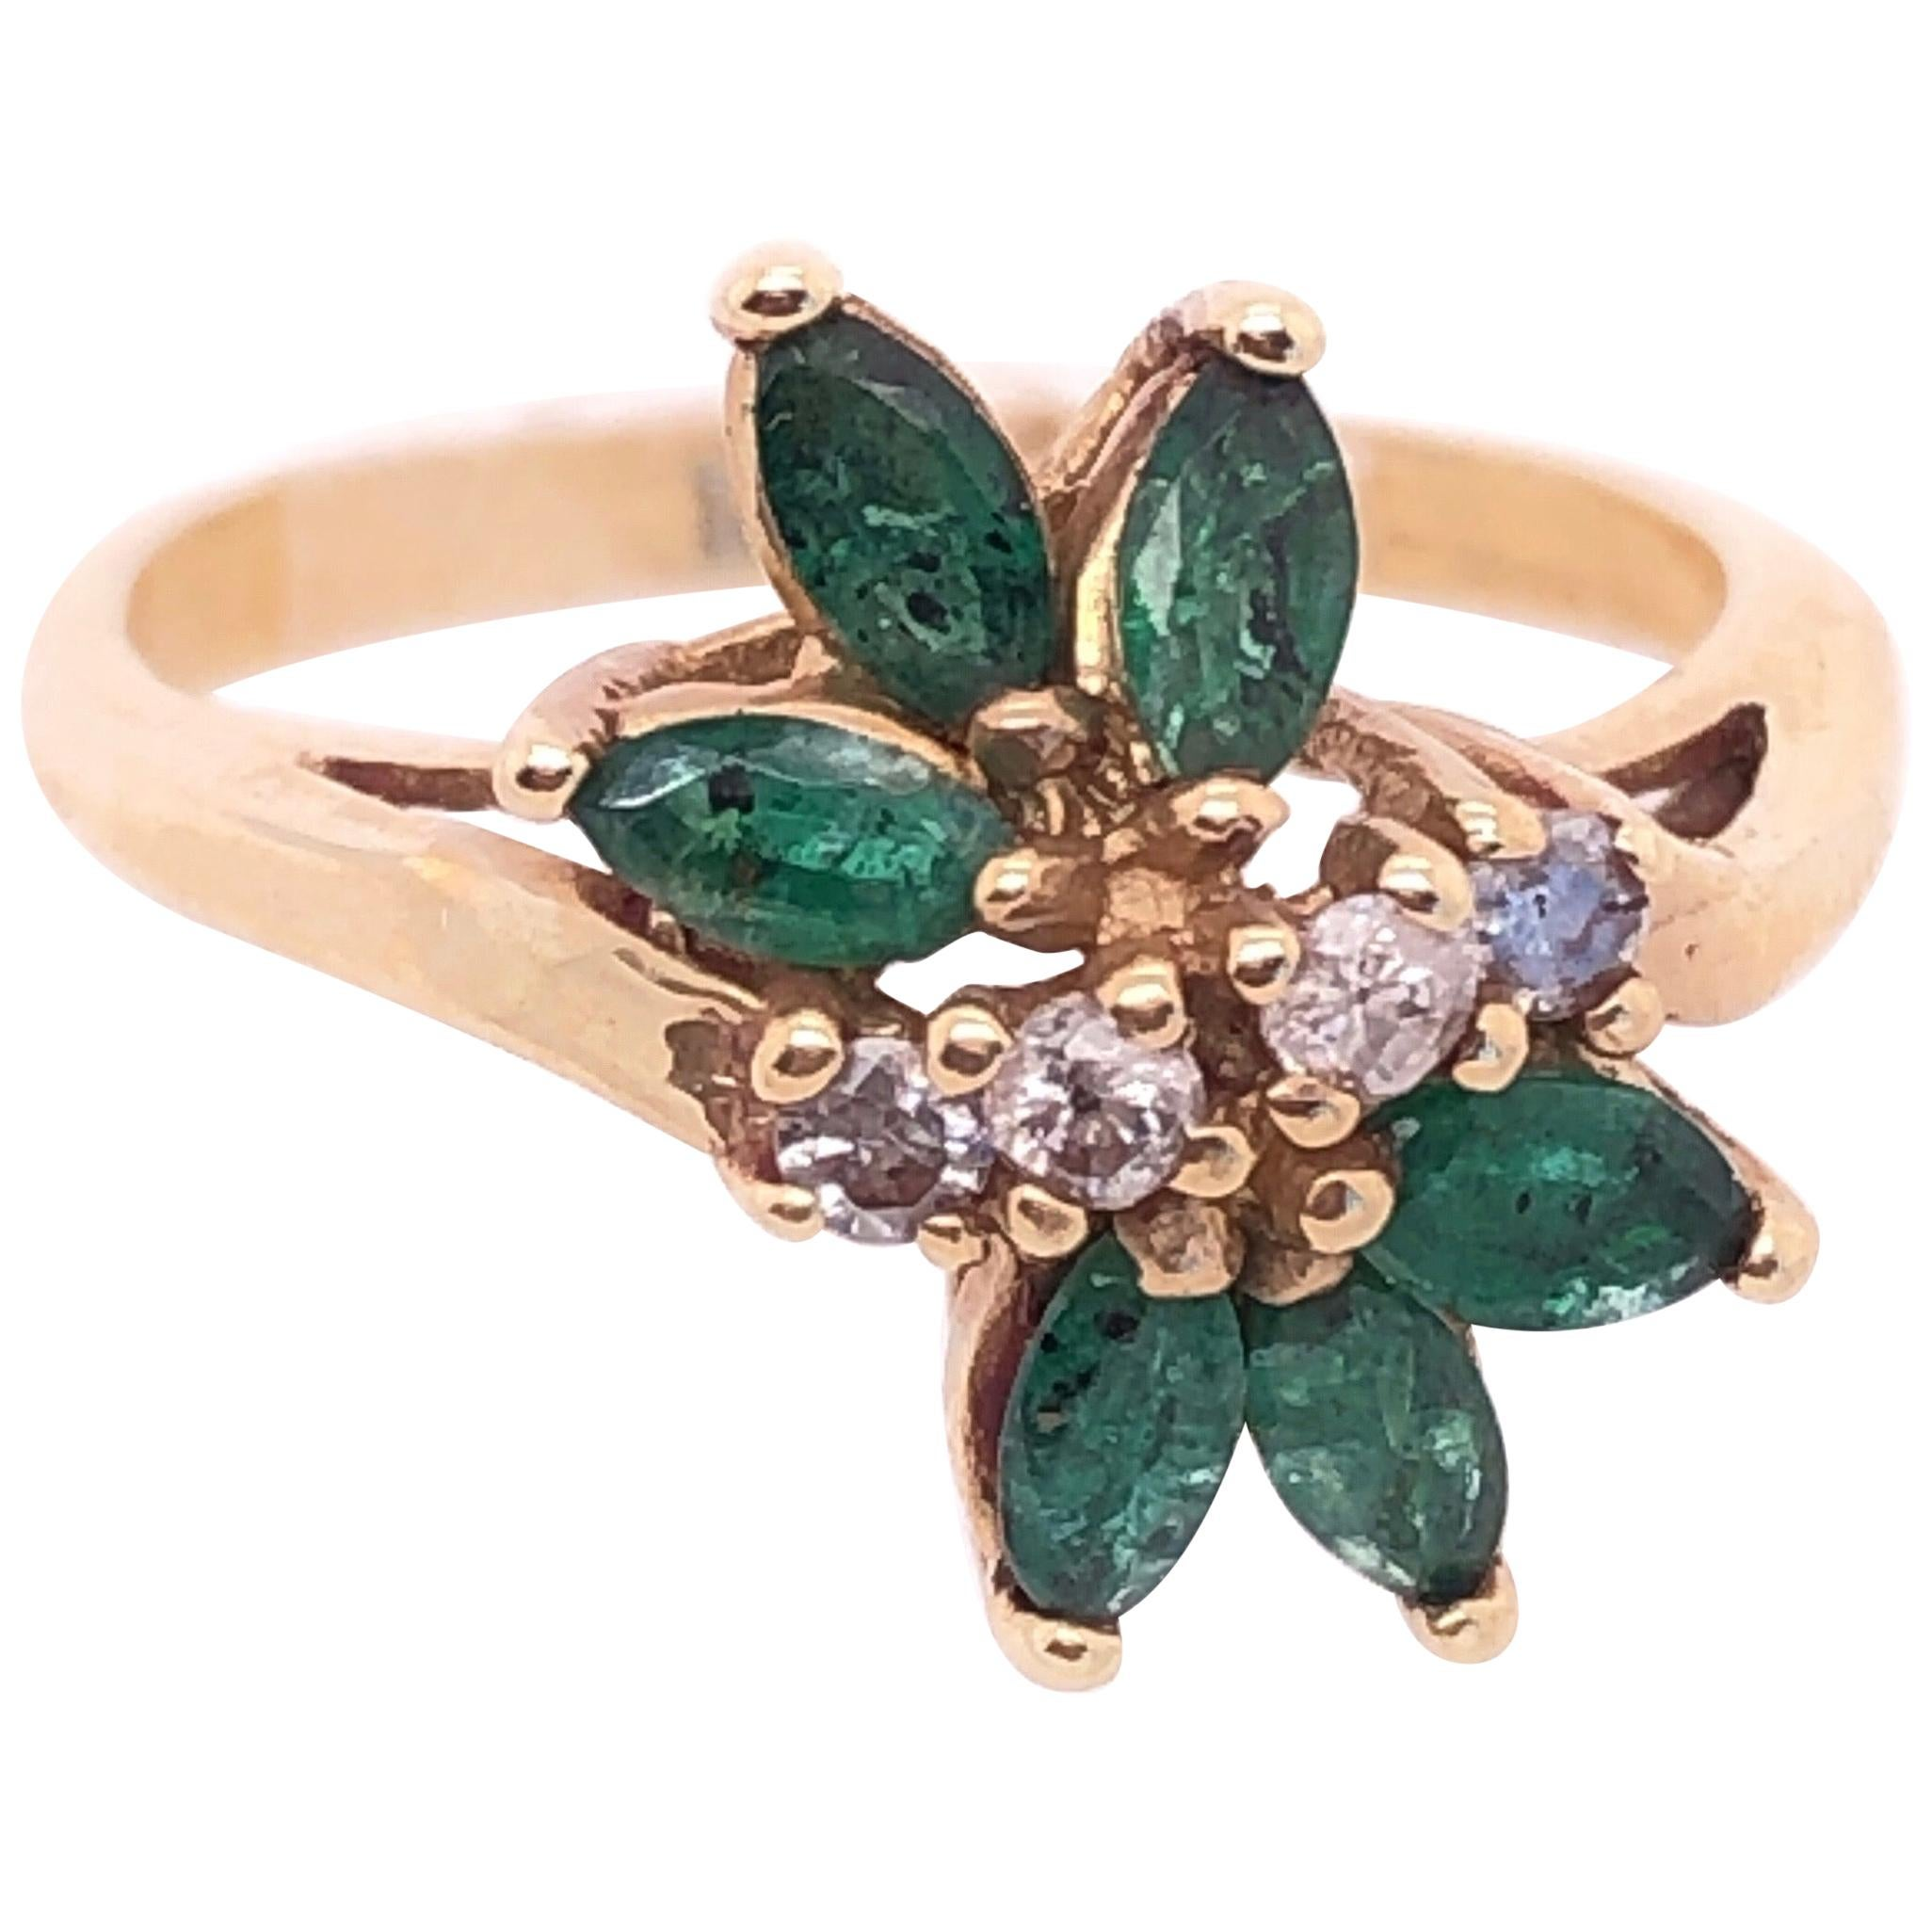 14 Karat Yellow Gold Freeform Emerald with Diamond Accents Ring